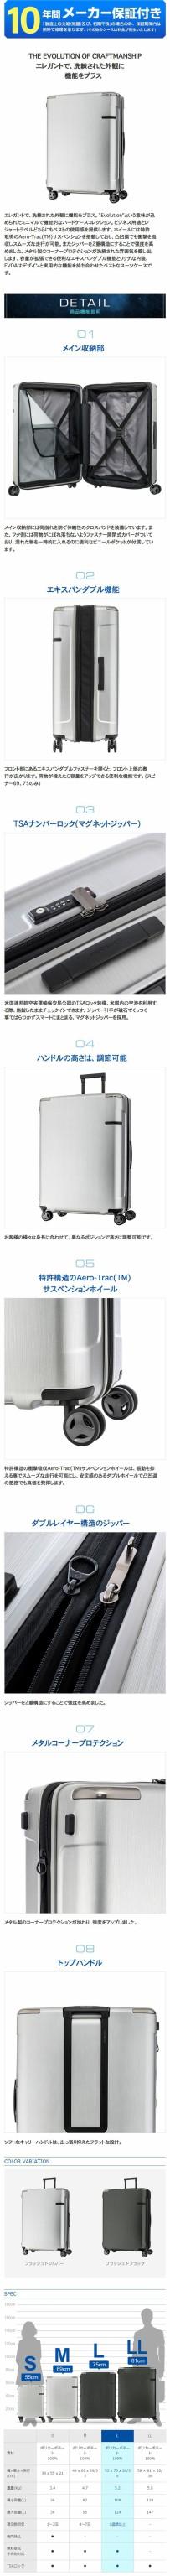 5589a92193 正規品 サムソナイト Samsonite スーツケース キャリーバッグEvoa ...